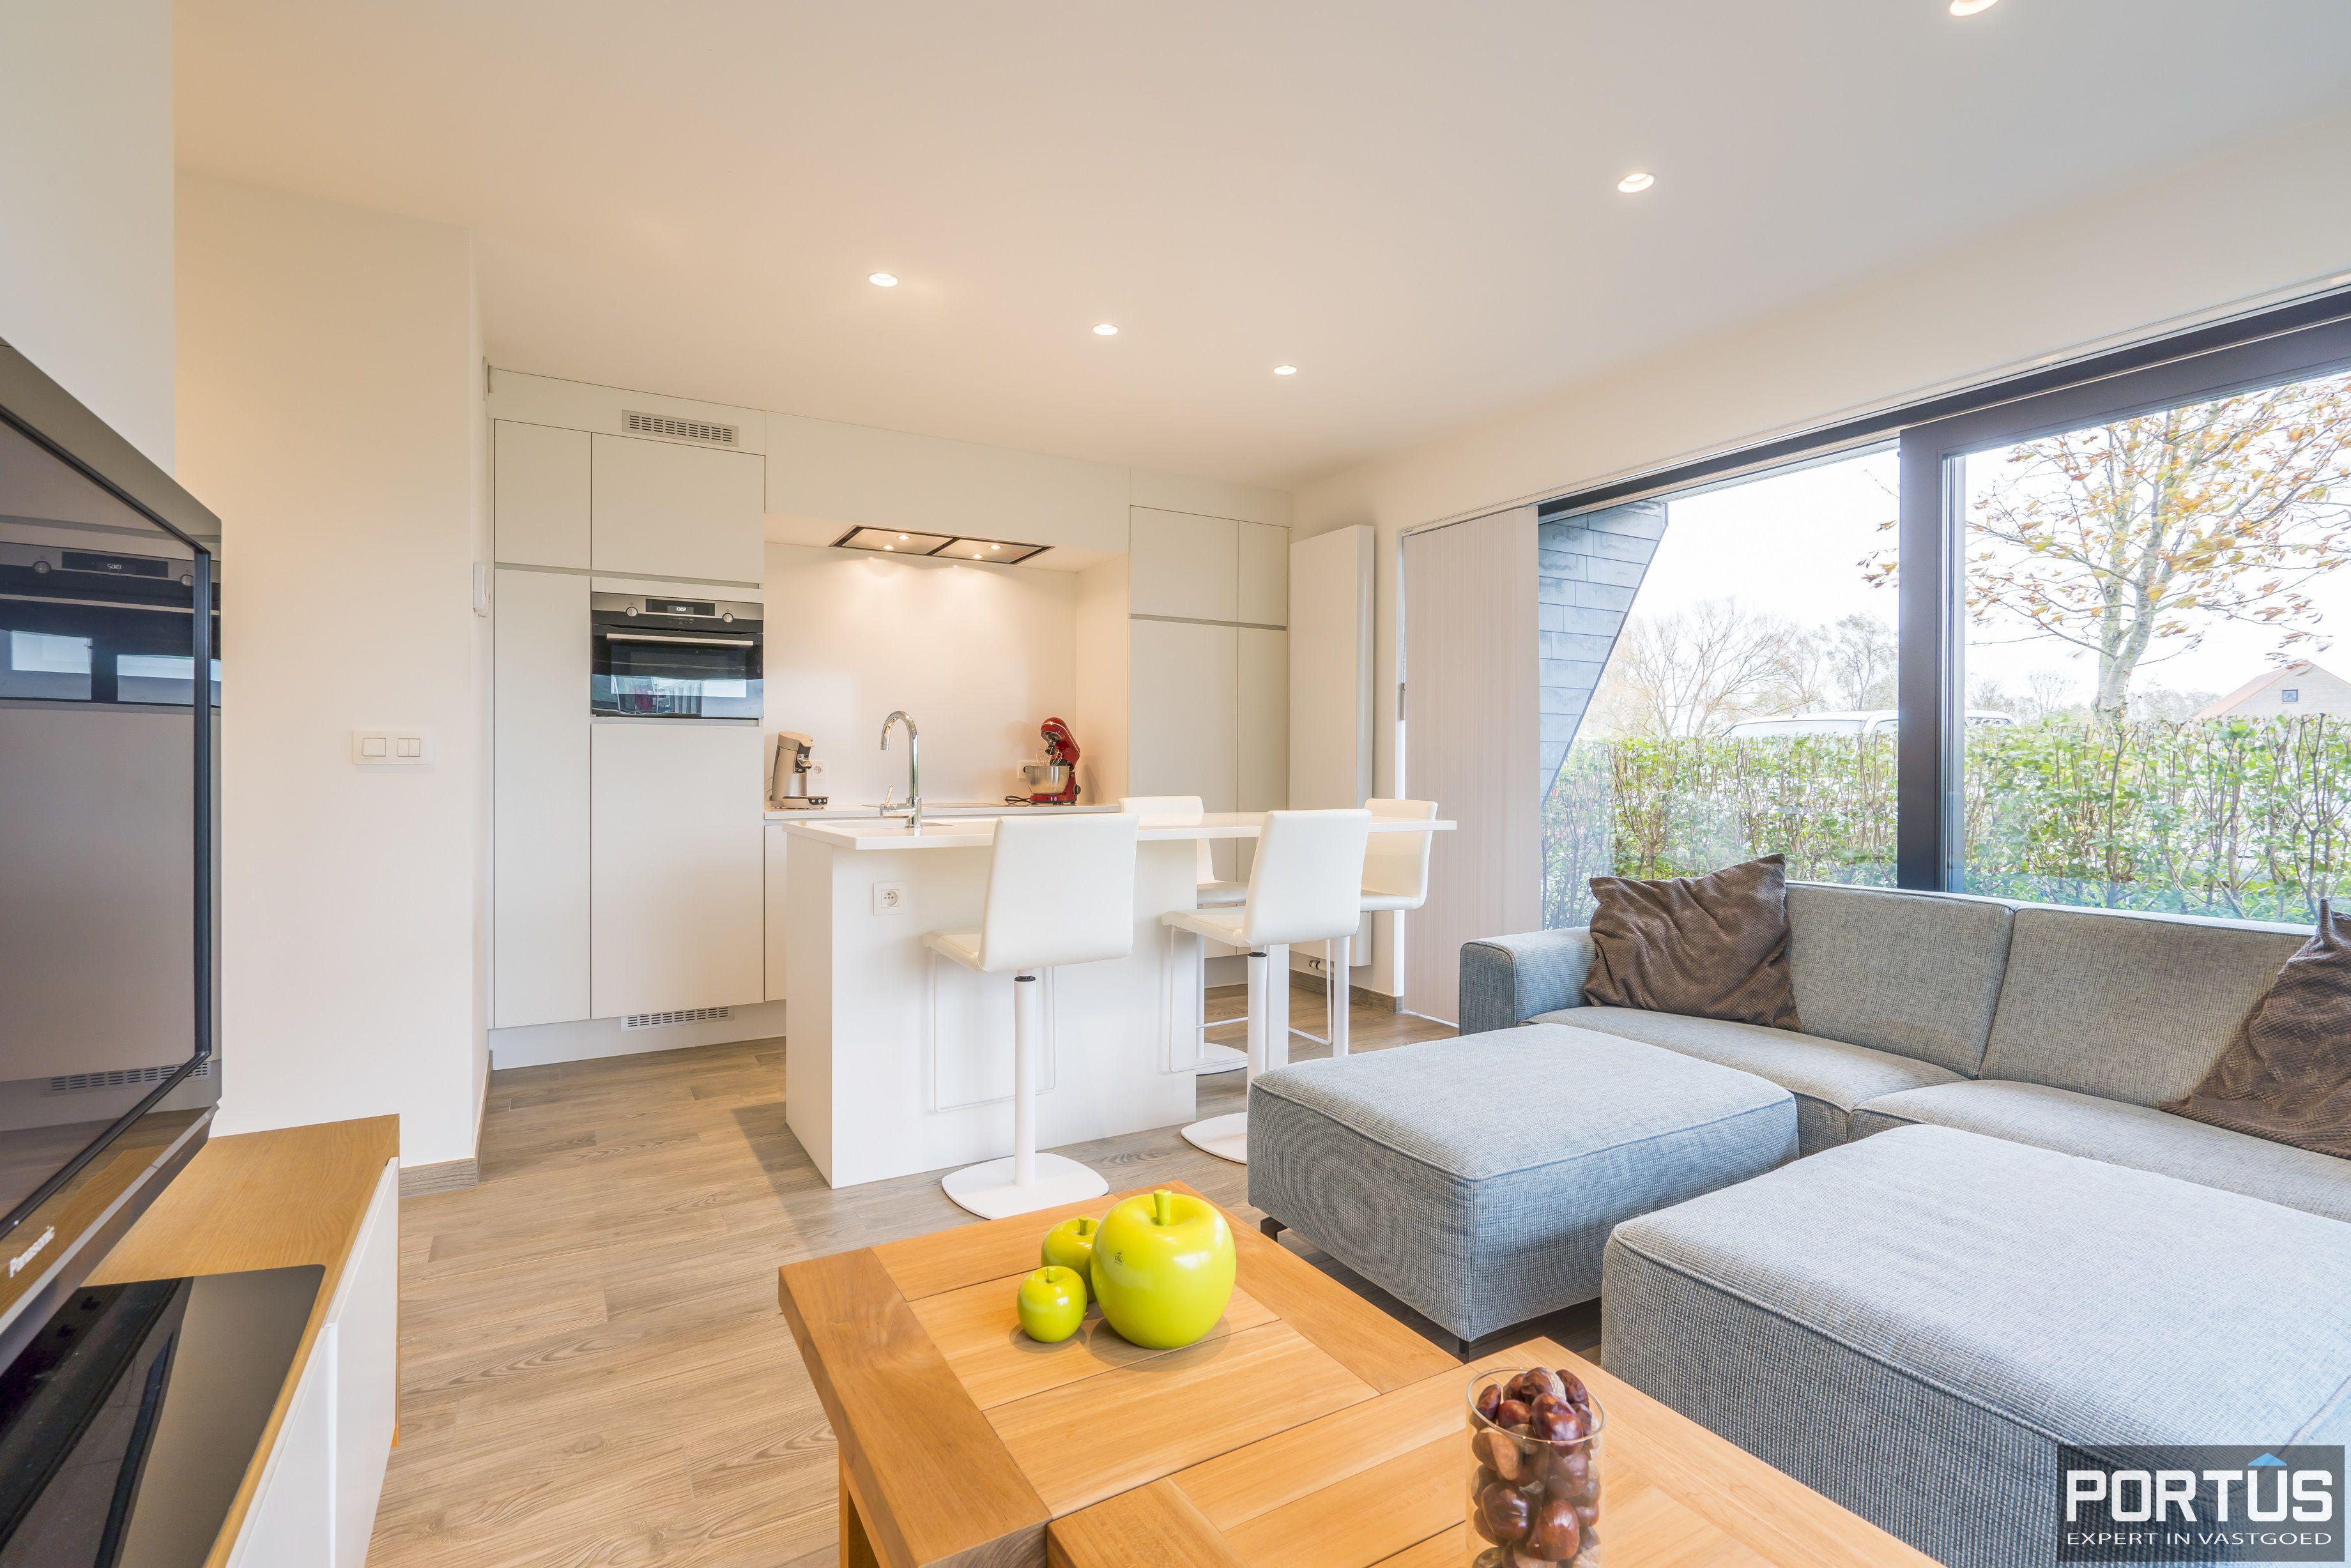 Appartement te koop met 2 slaapkamers in Residentie Waterfront te Nieuwpoort - 11863